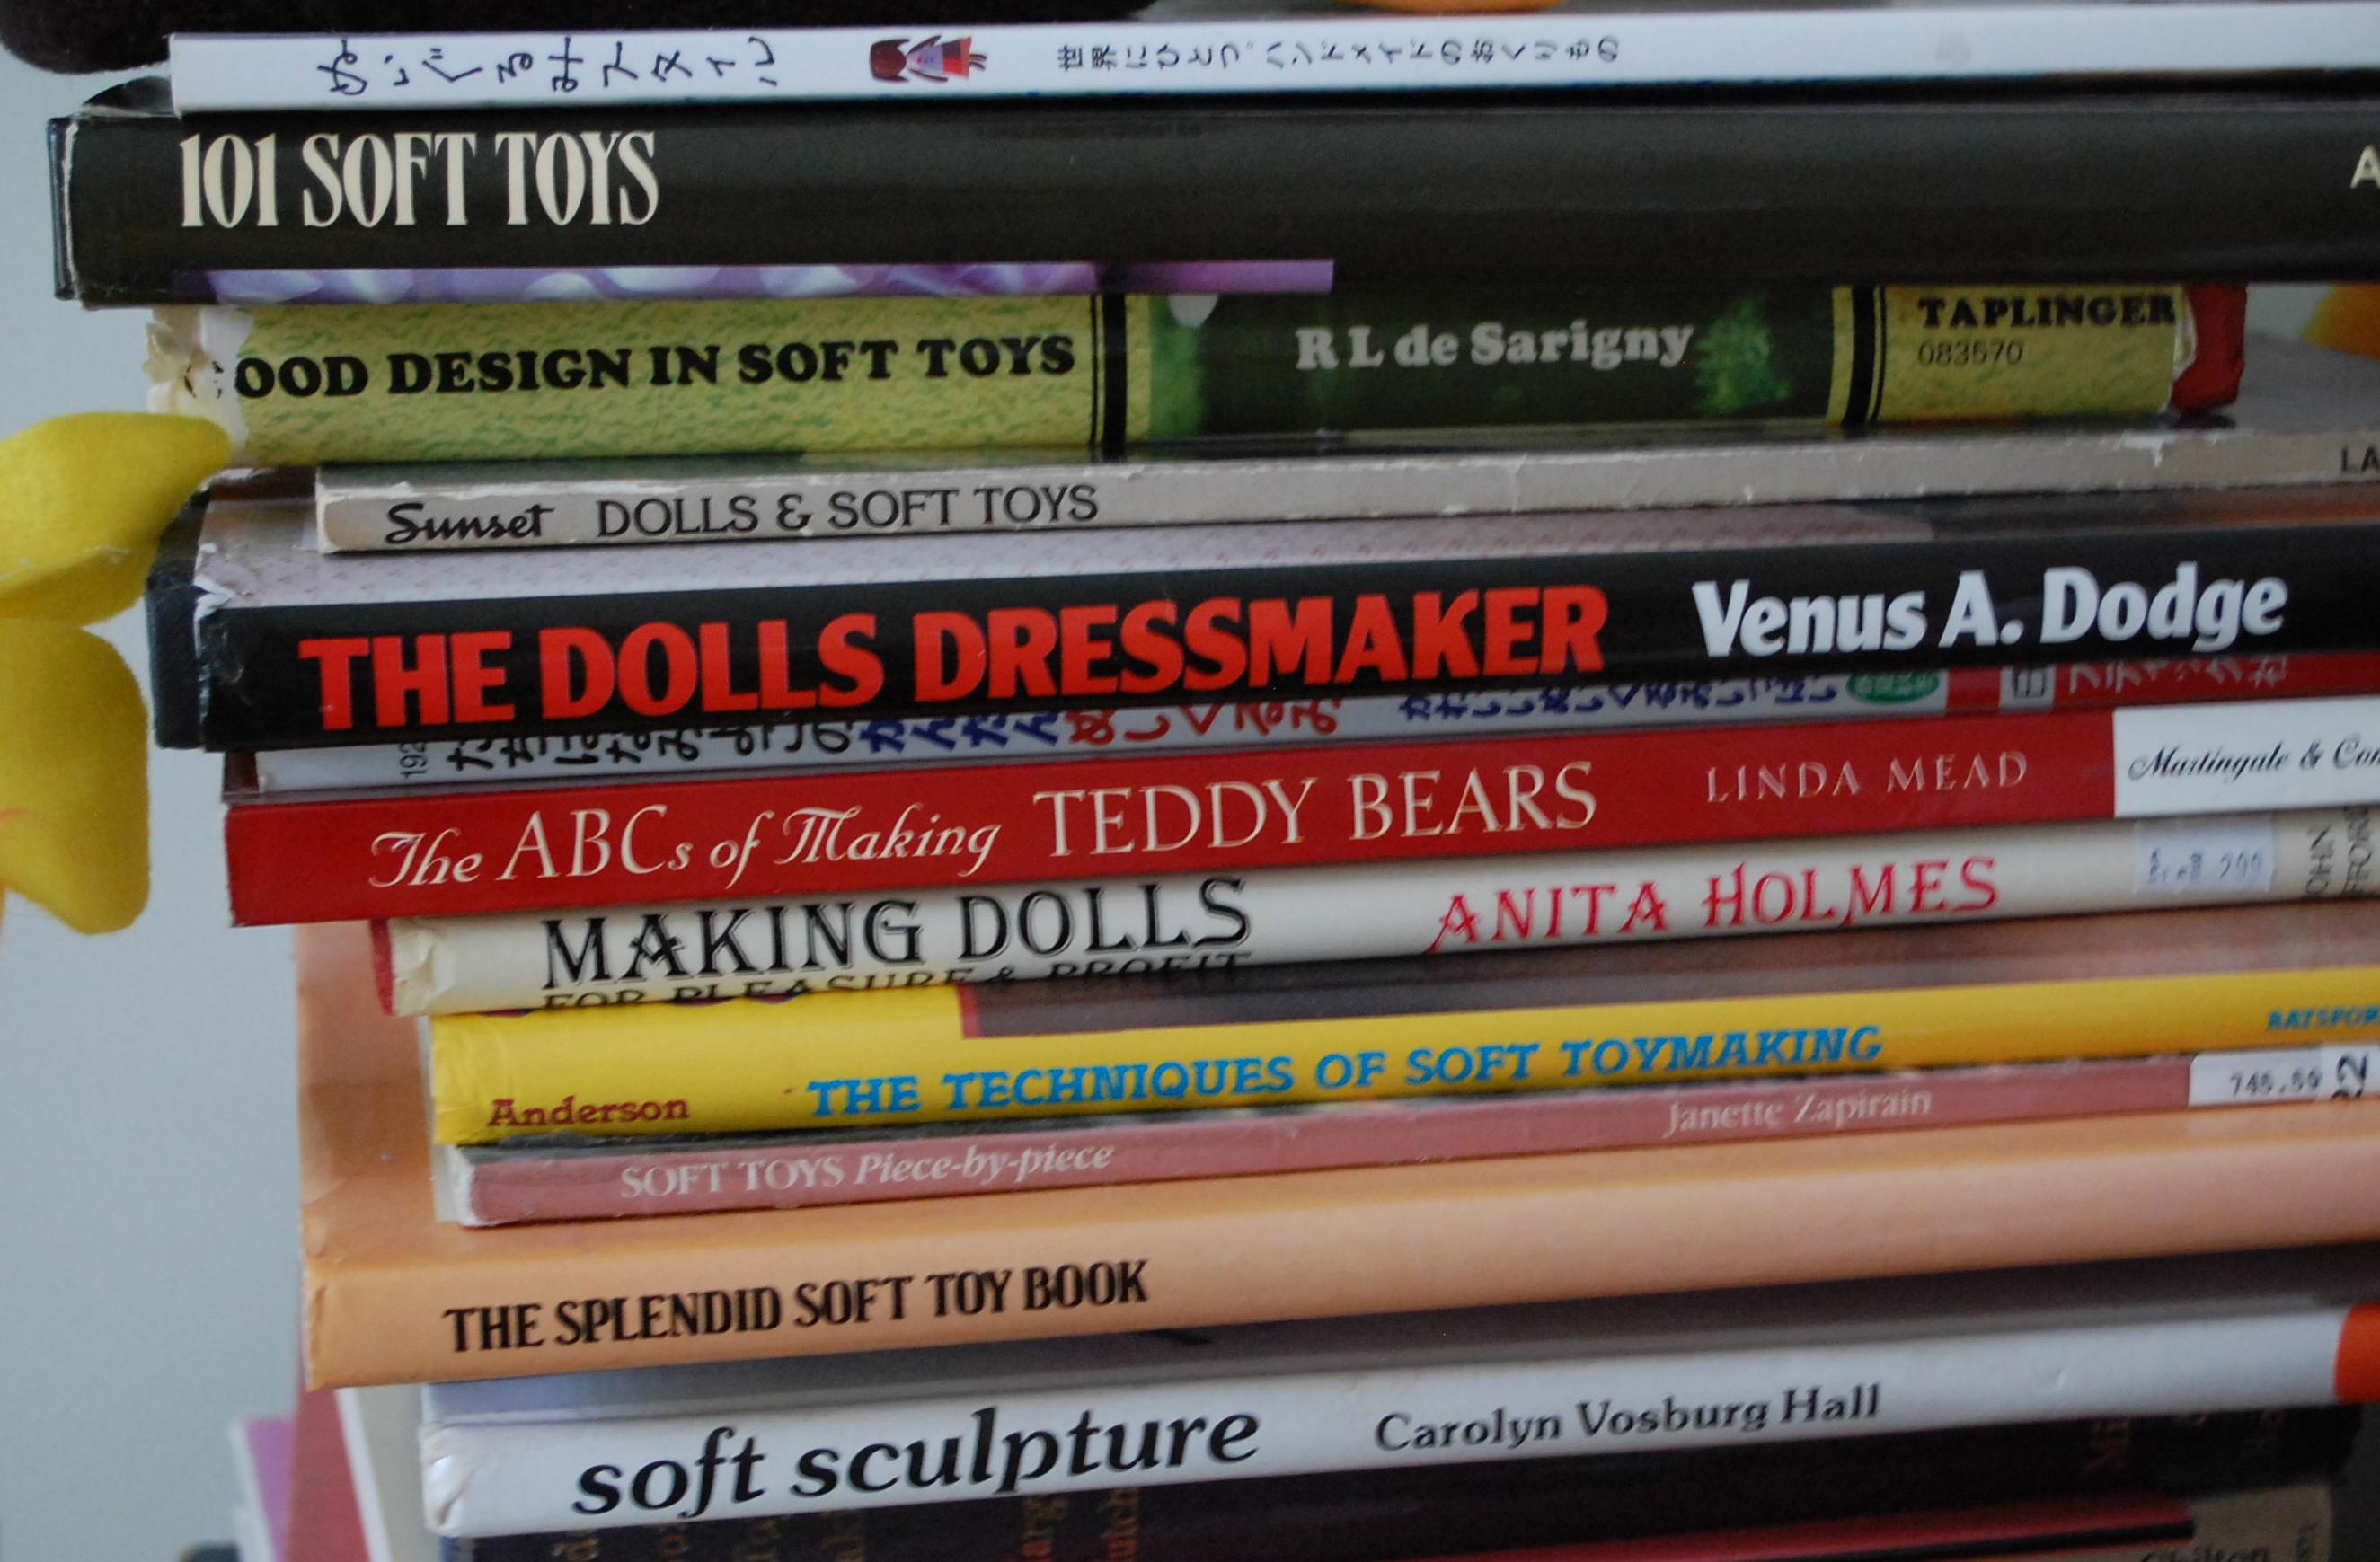 How To Review A Craft Book A Blogger S Guide Whileshenaps Com